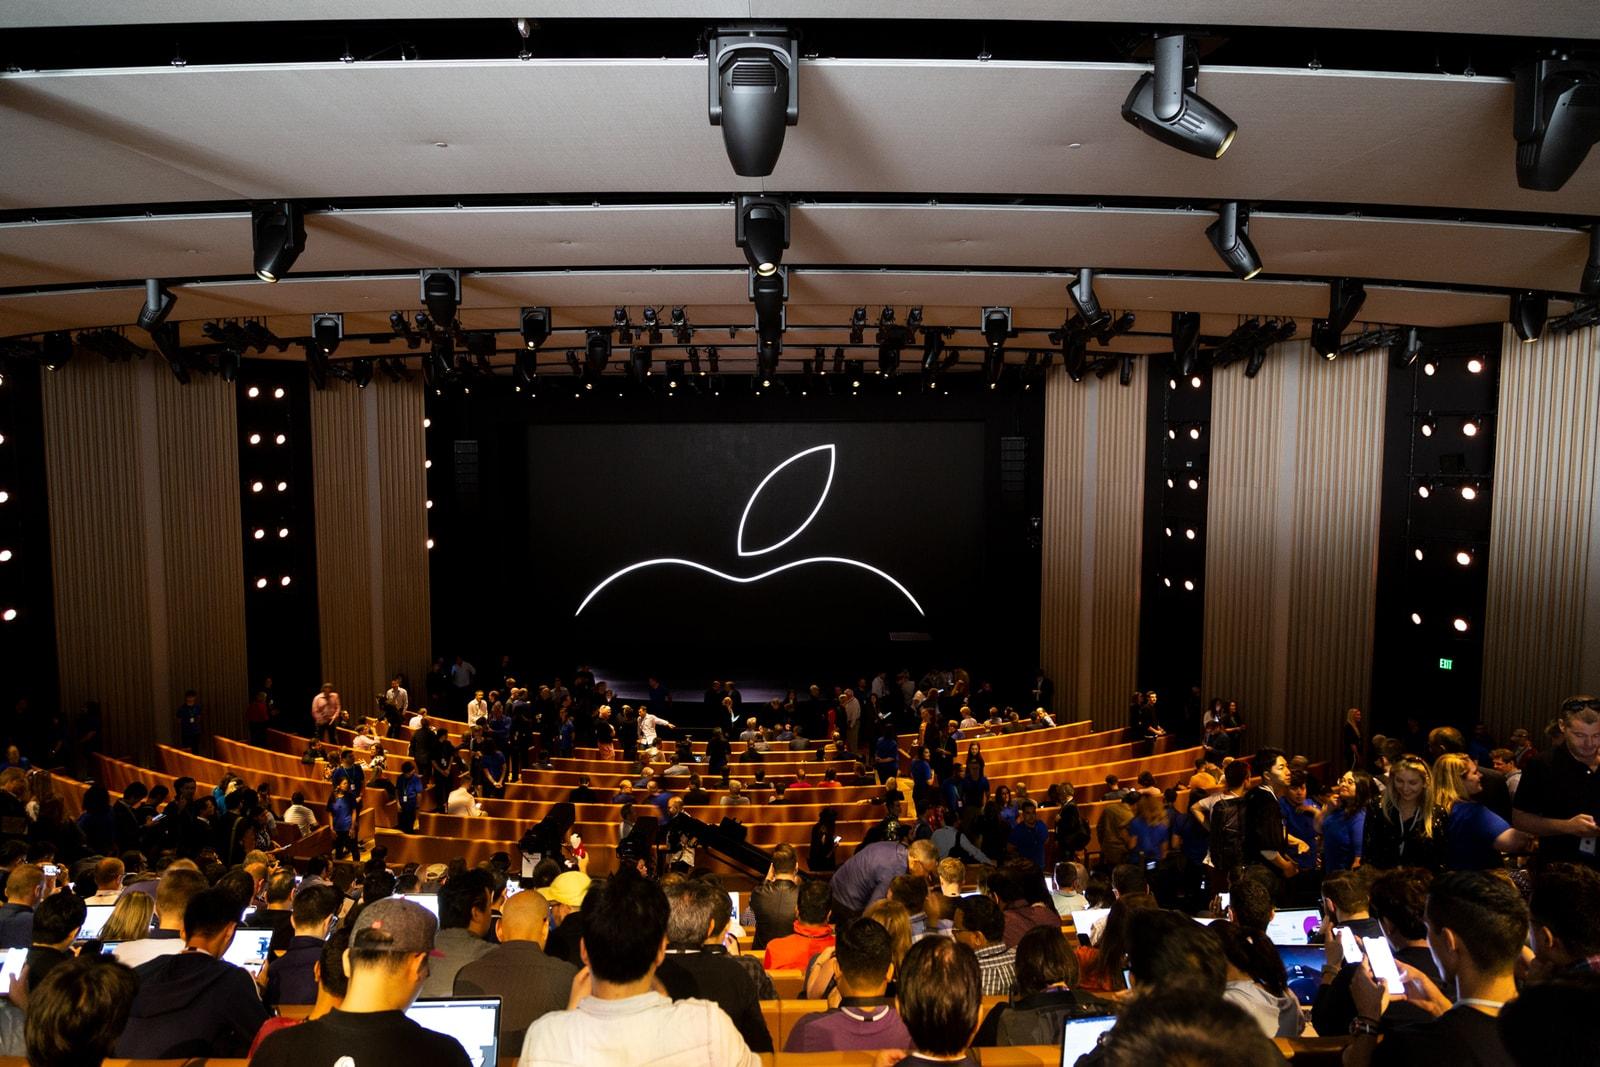 Apple iPhone XS Macbook Pro Apple Watch